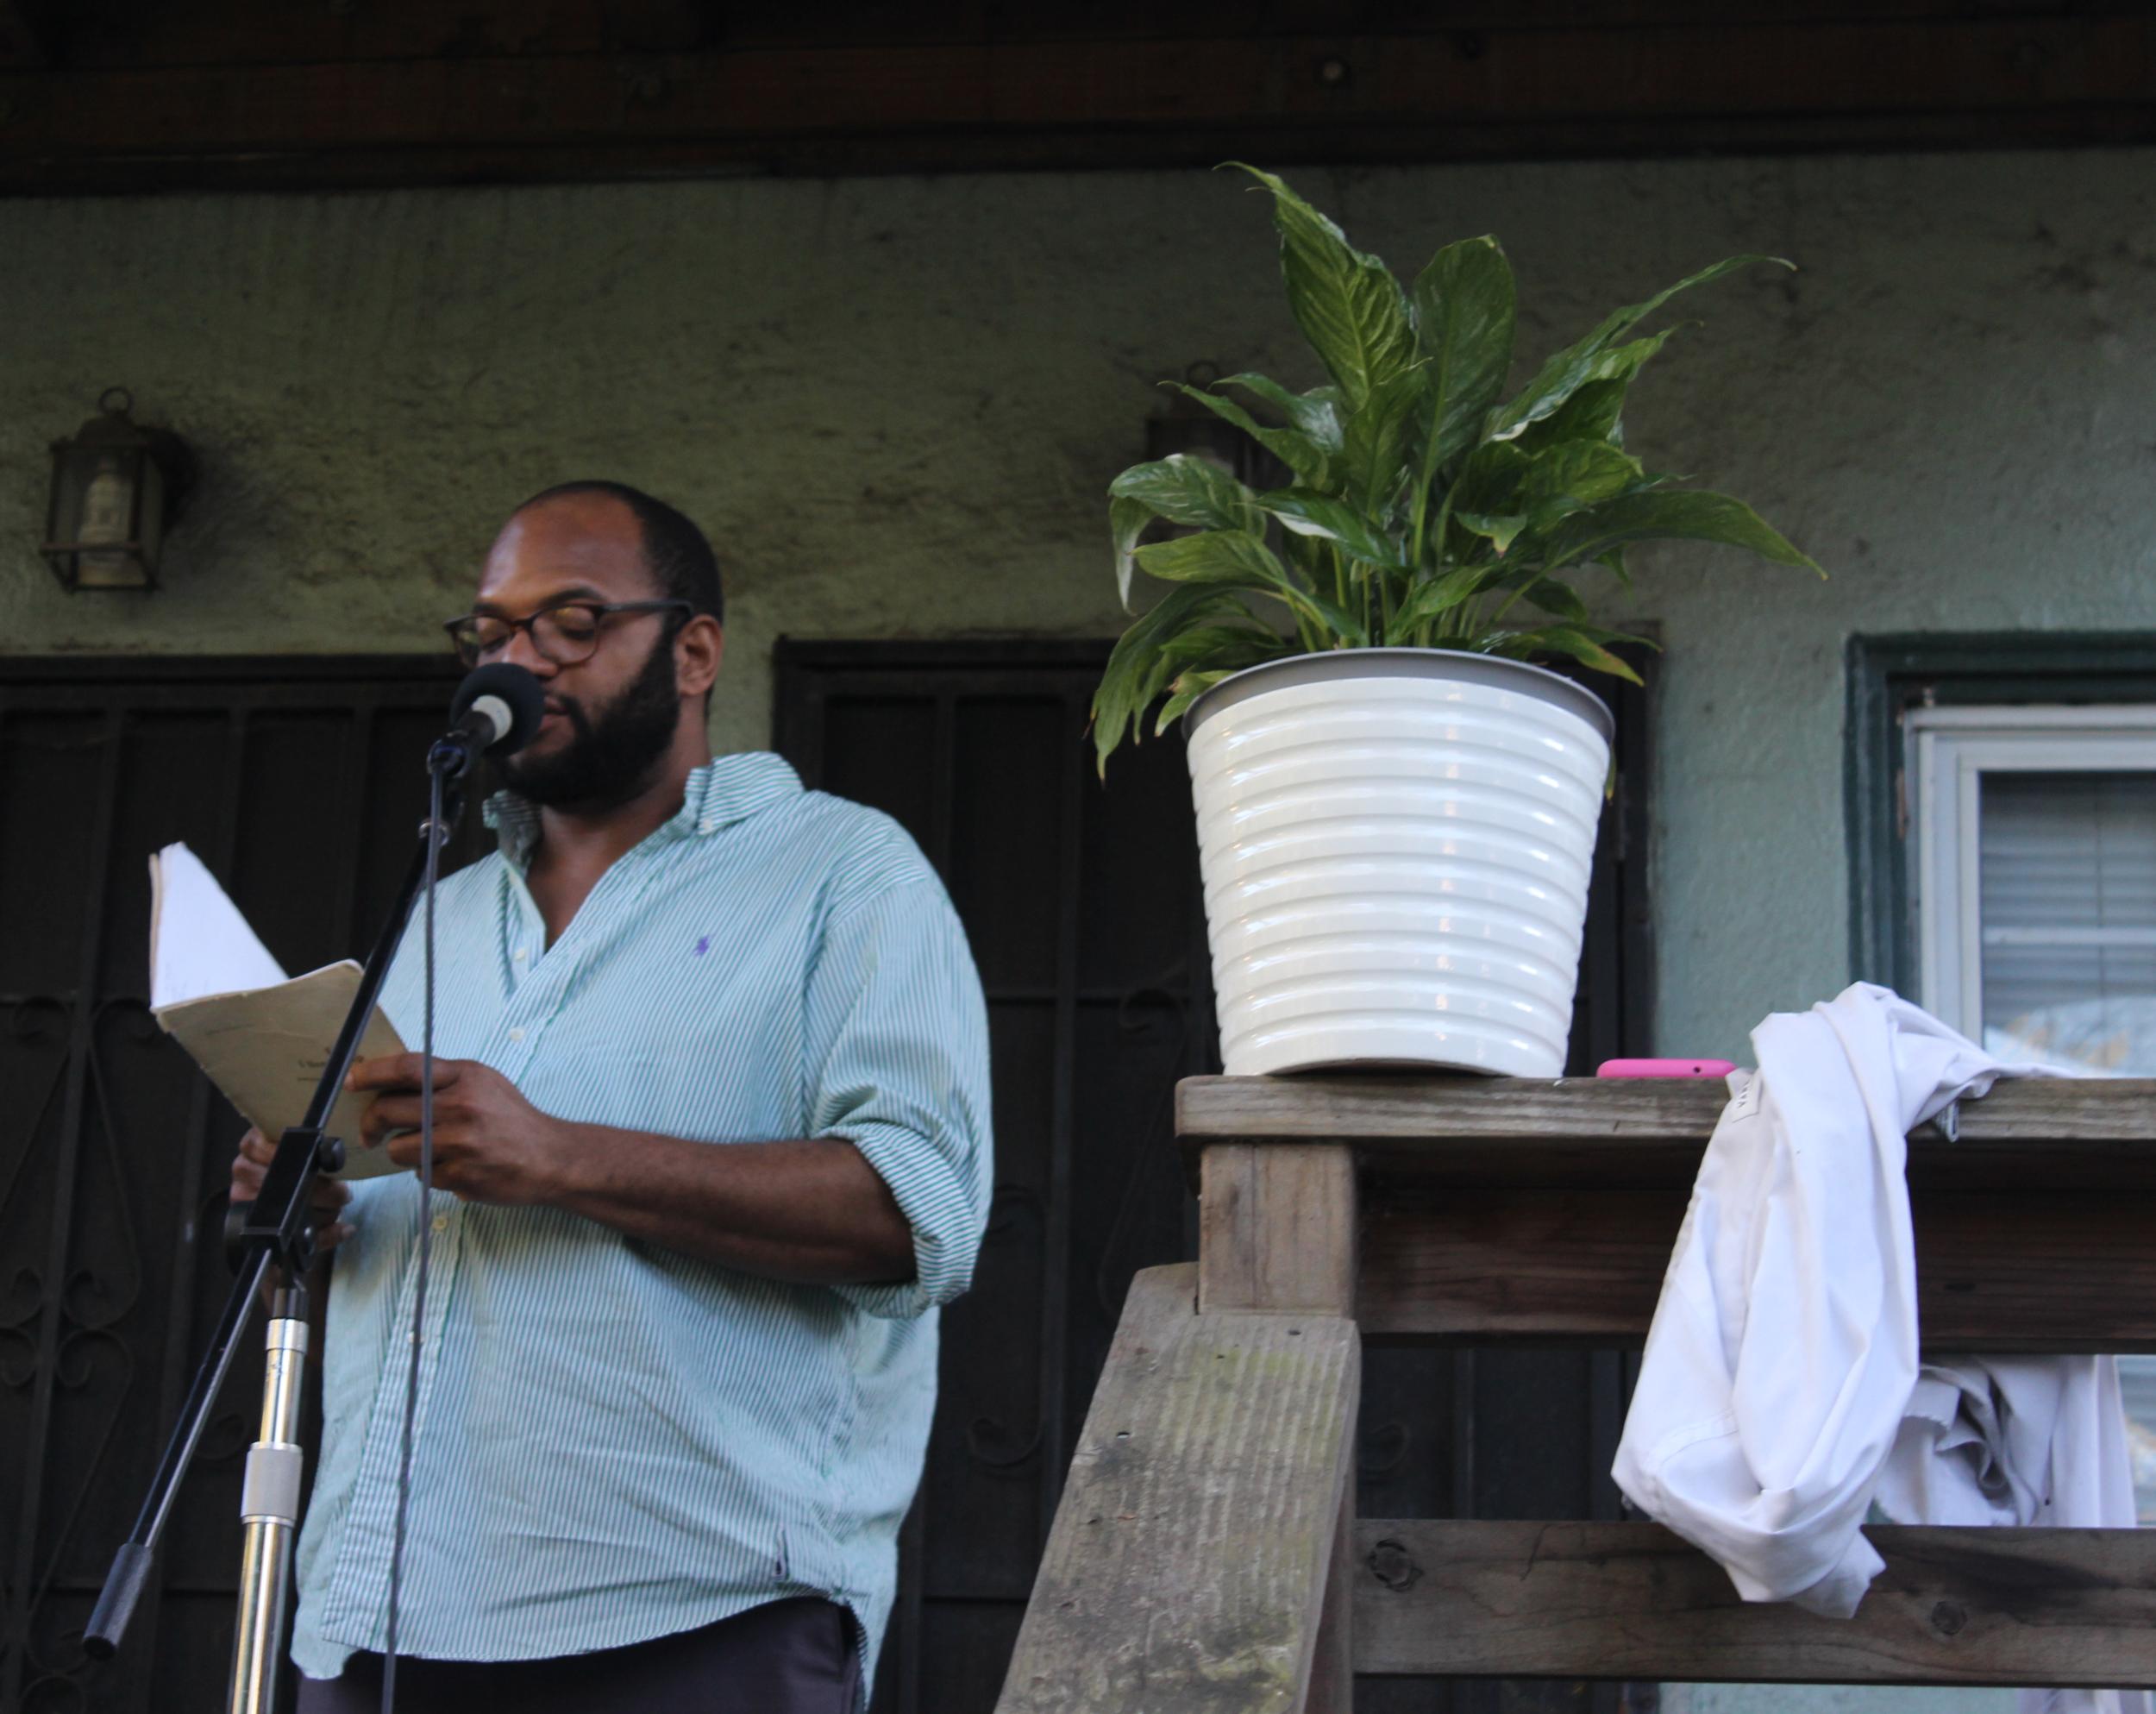 DeWayne Frazier Dickerson reads Poetry in the Oak Center Neighborhood of West oakland on march 16th 2019